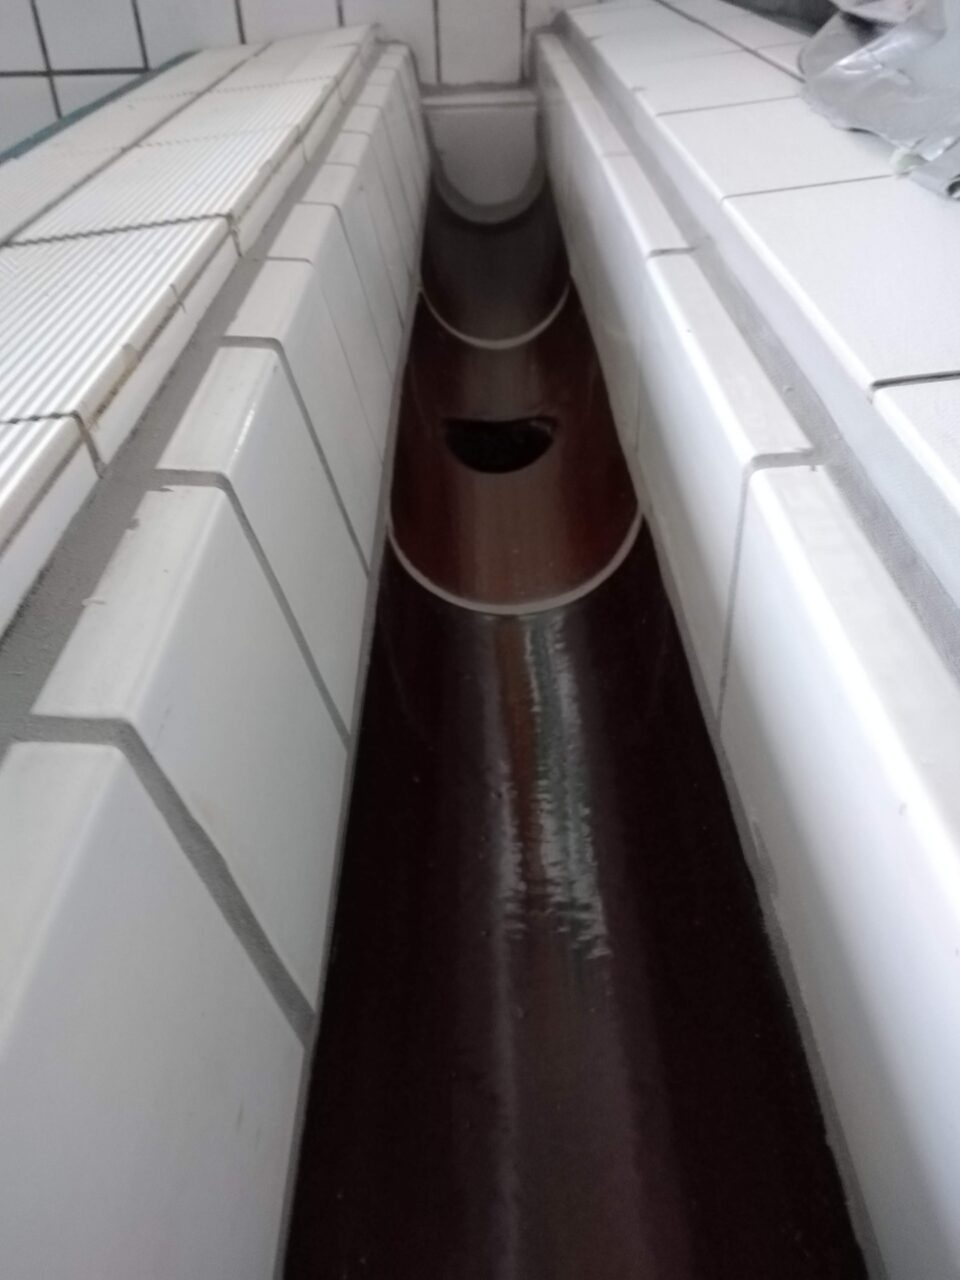 Concrete repair with epoxy repair mortar, Belzona 4111